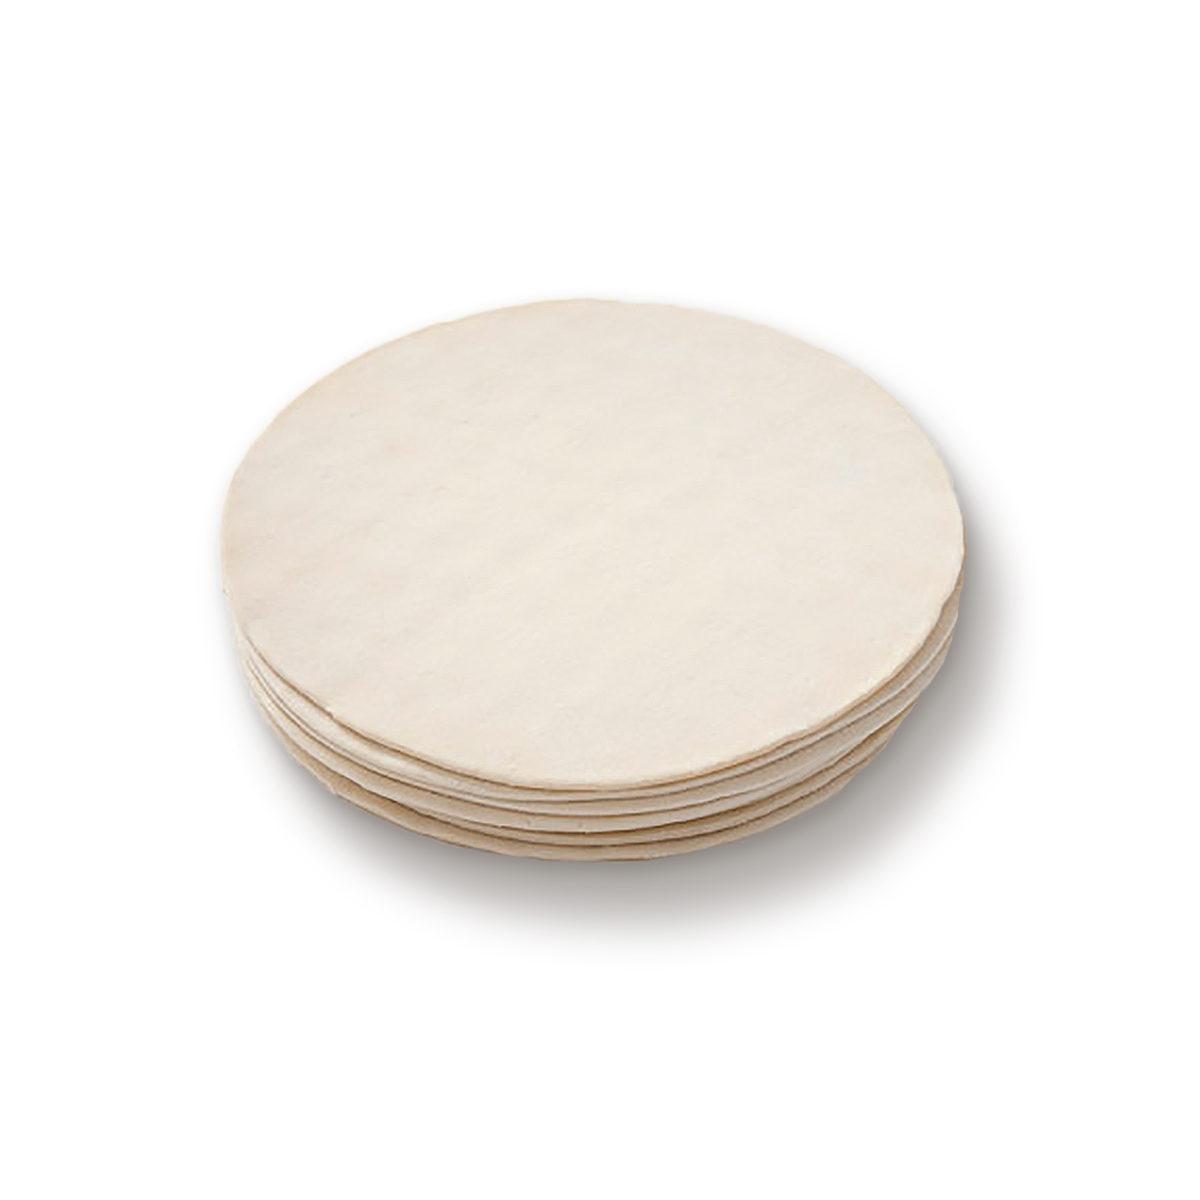 Pizza disc